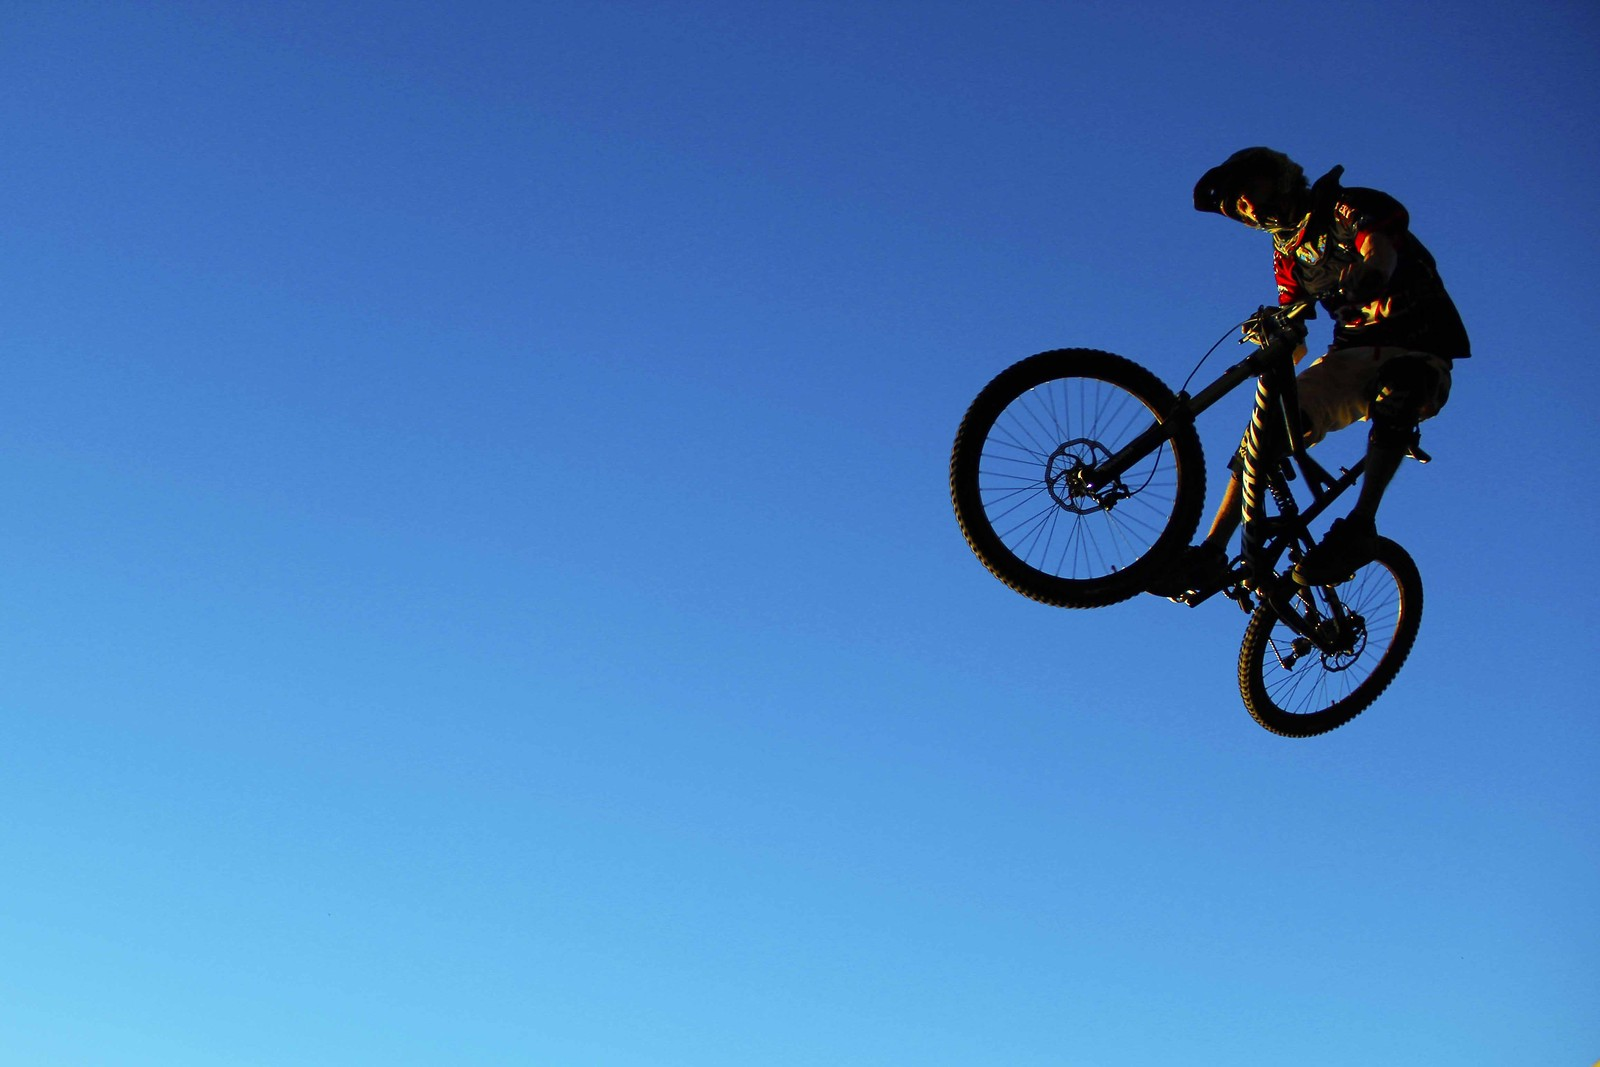 looking up hip shot - GnarHuck - Mountain Biking Pictures - Vital MTB